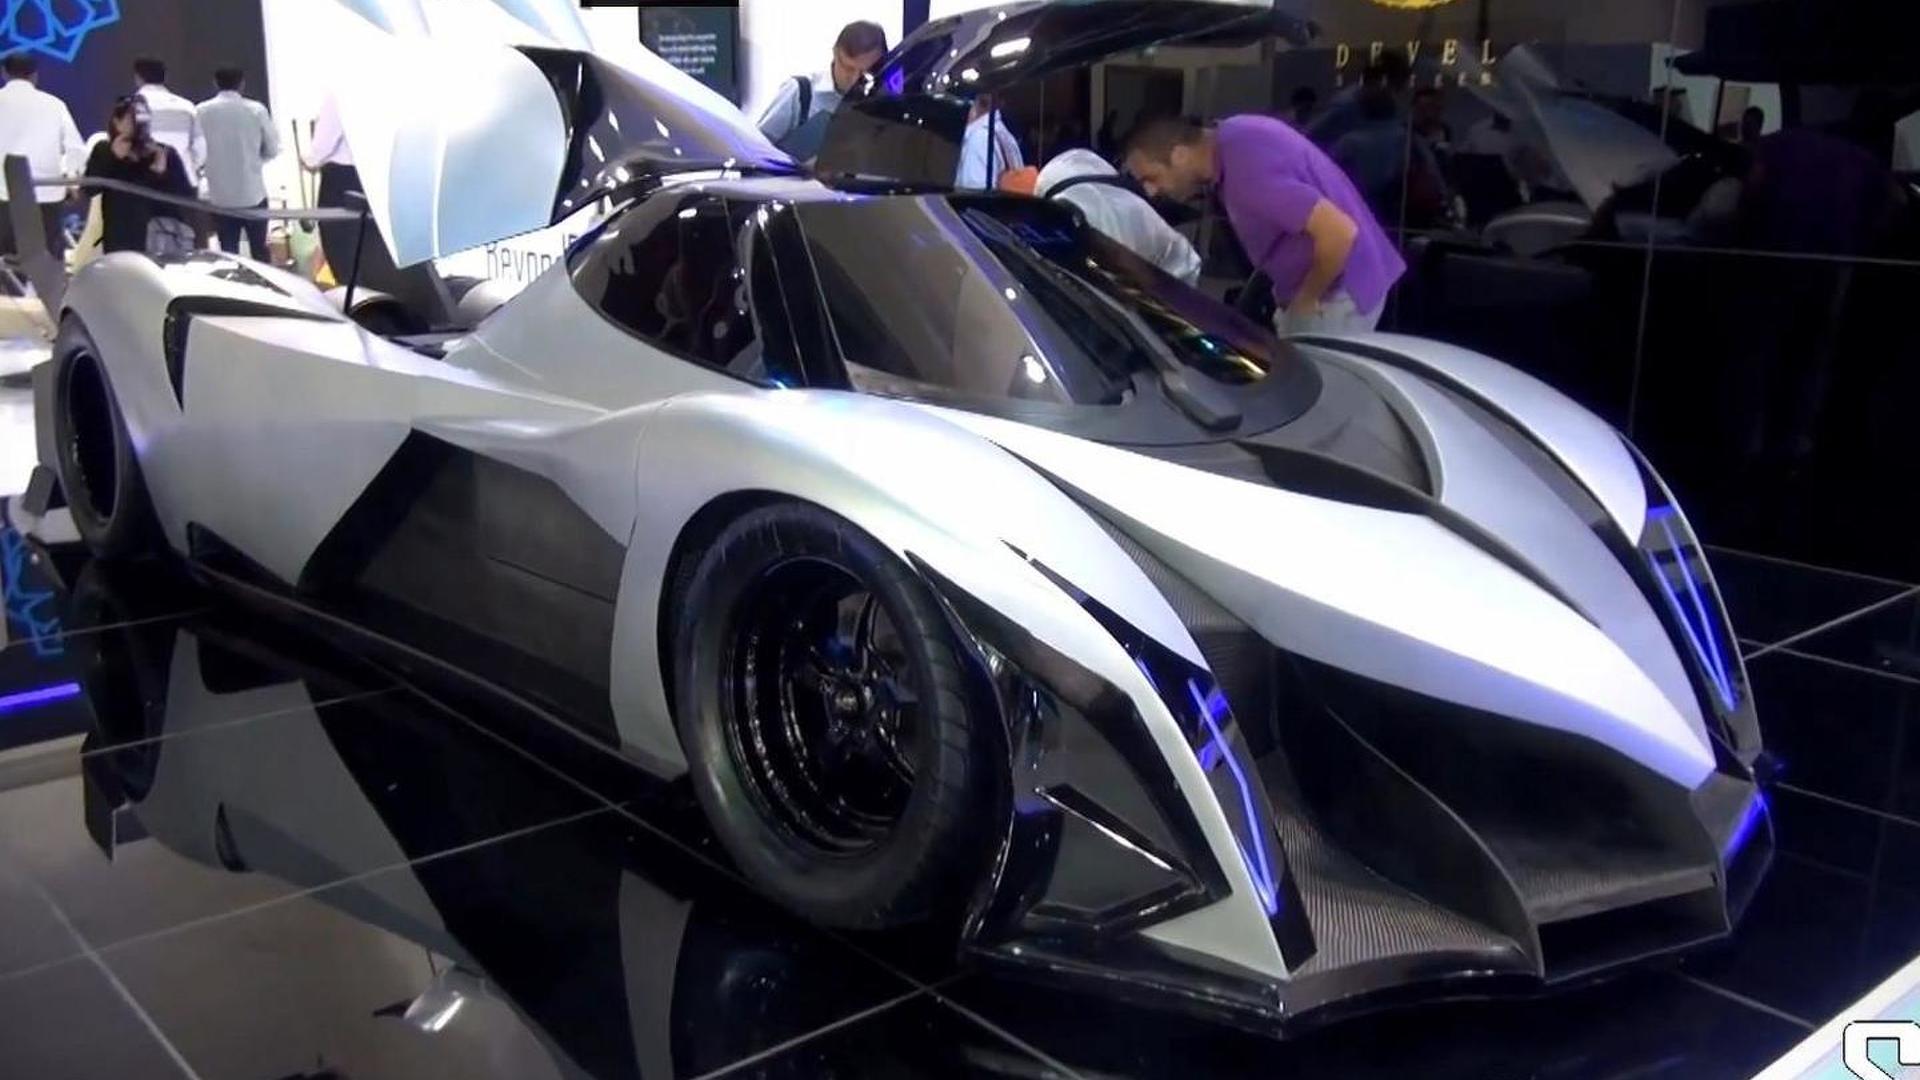 V Bhp Devel Sixteen Unveiled At Dubai Motor Show Is Probably - Car show dubai